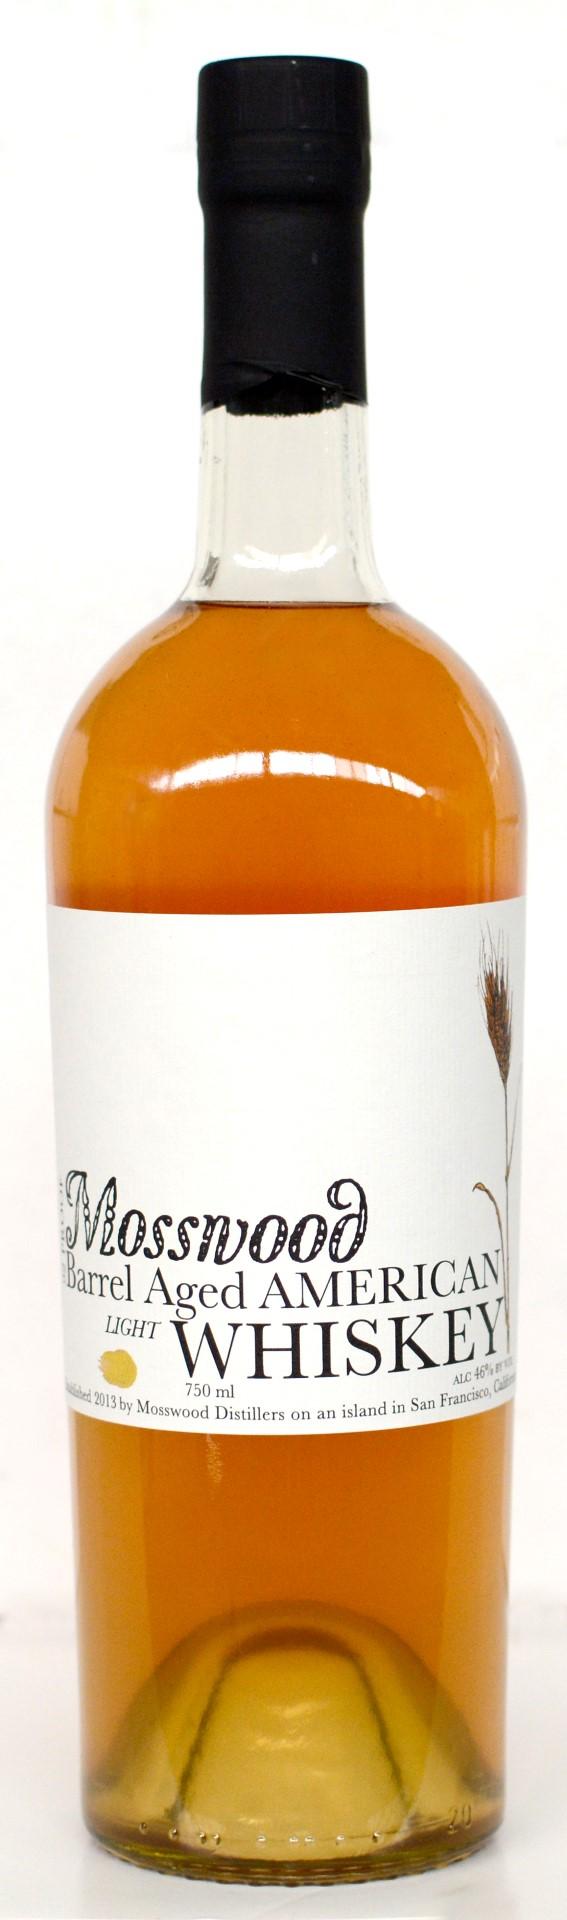 Mosswood Distillers Apple Brandy Barrel Aged Light American Whiskey